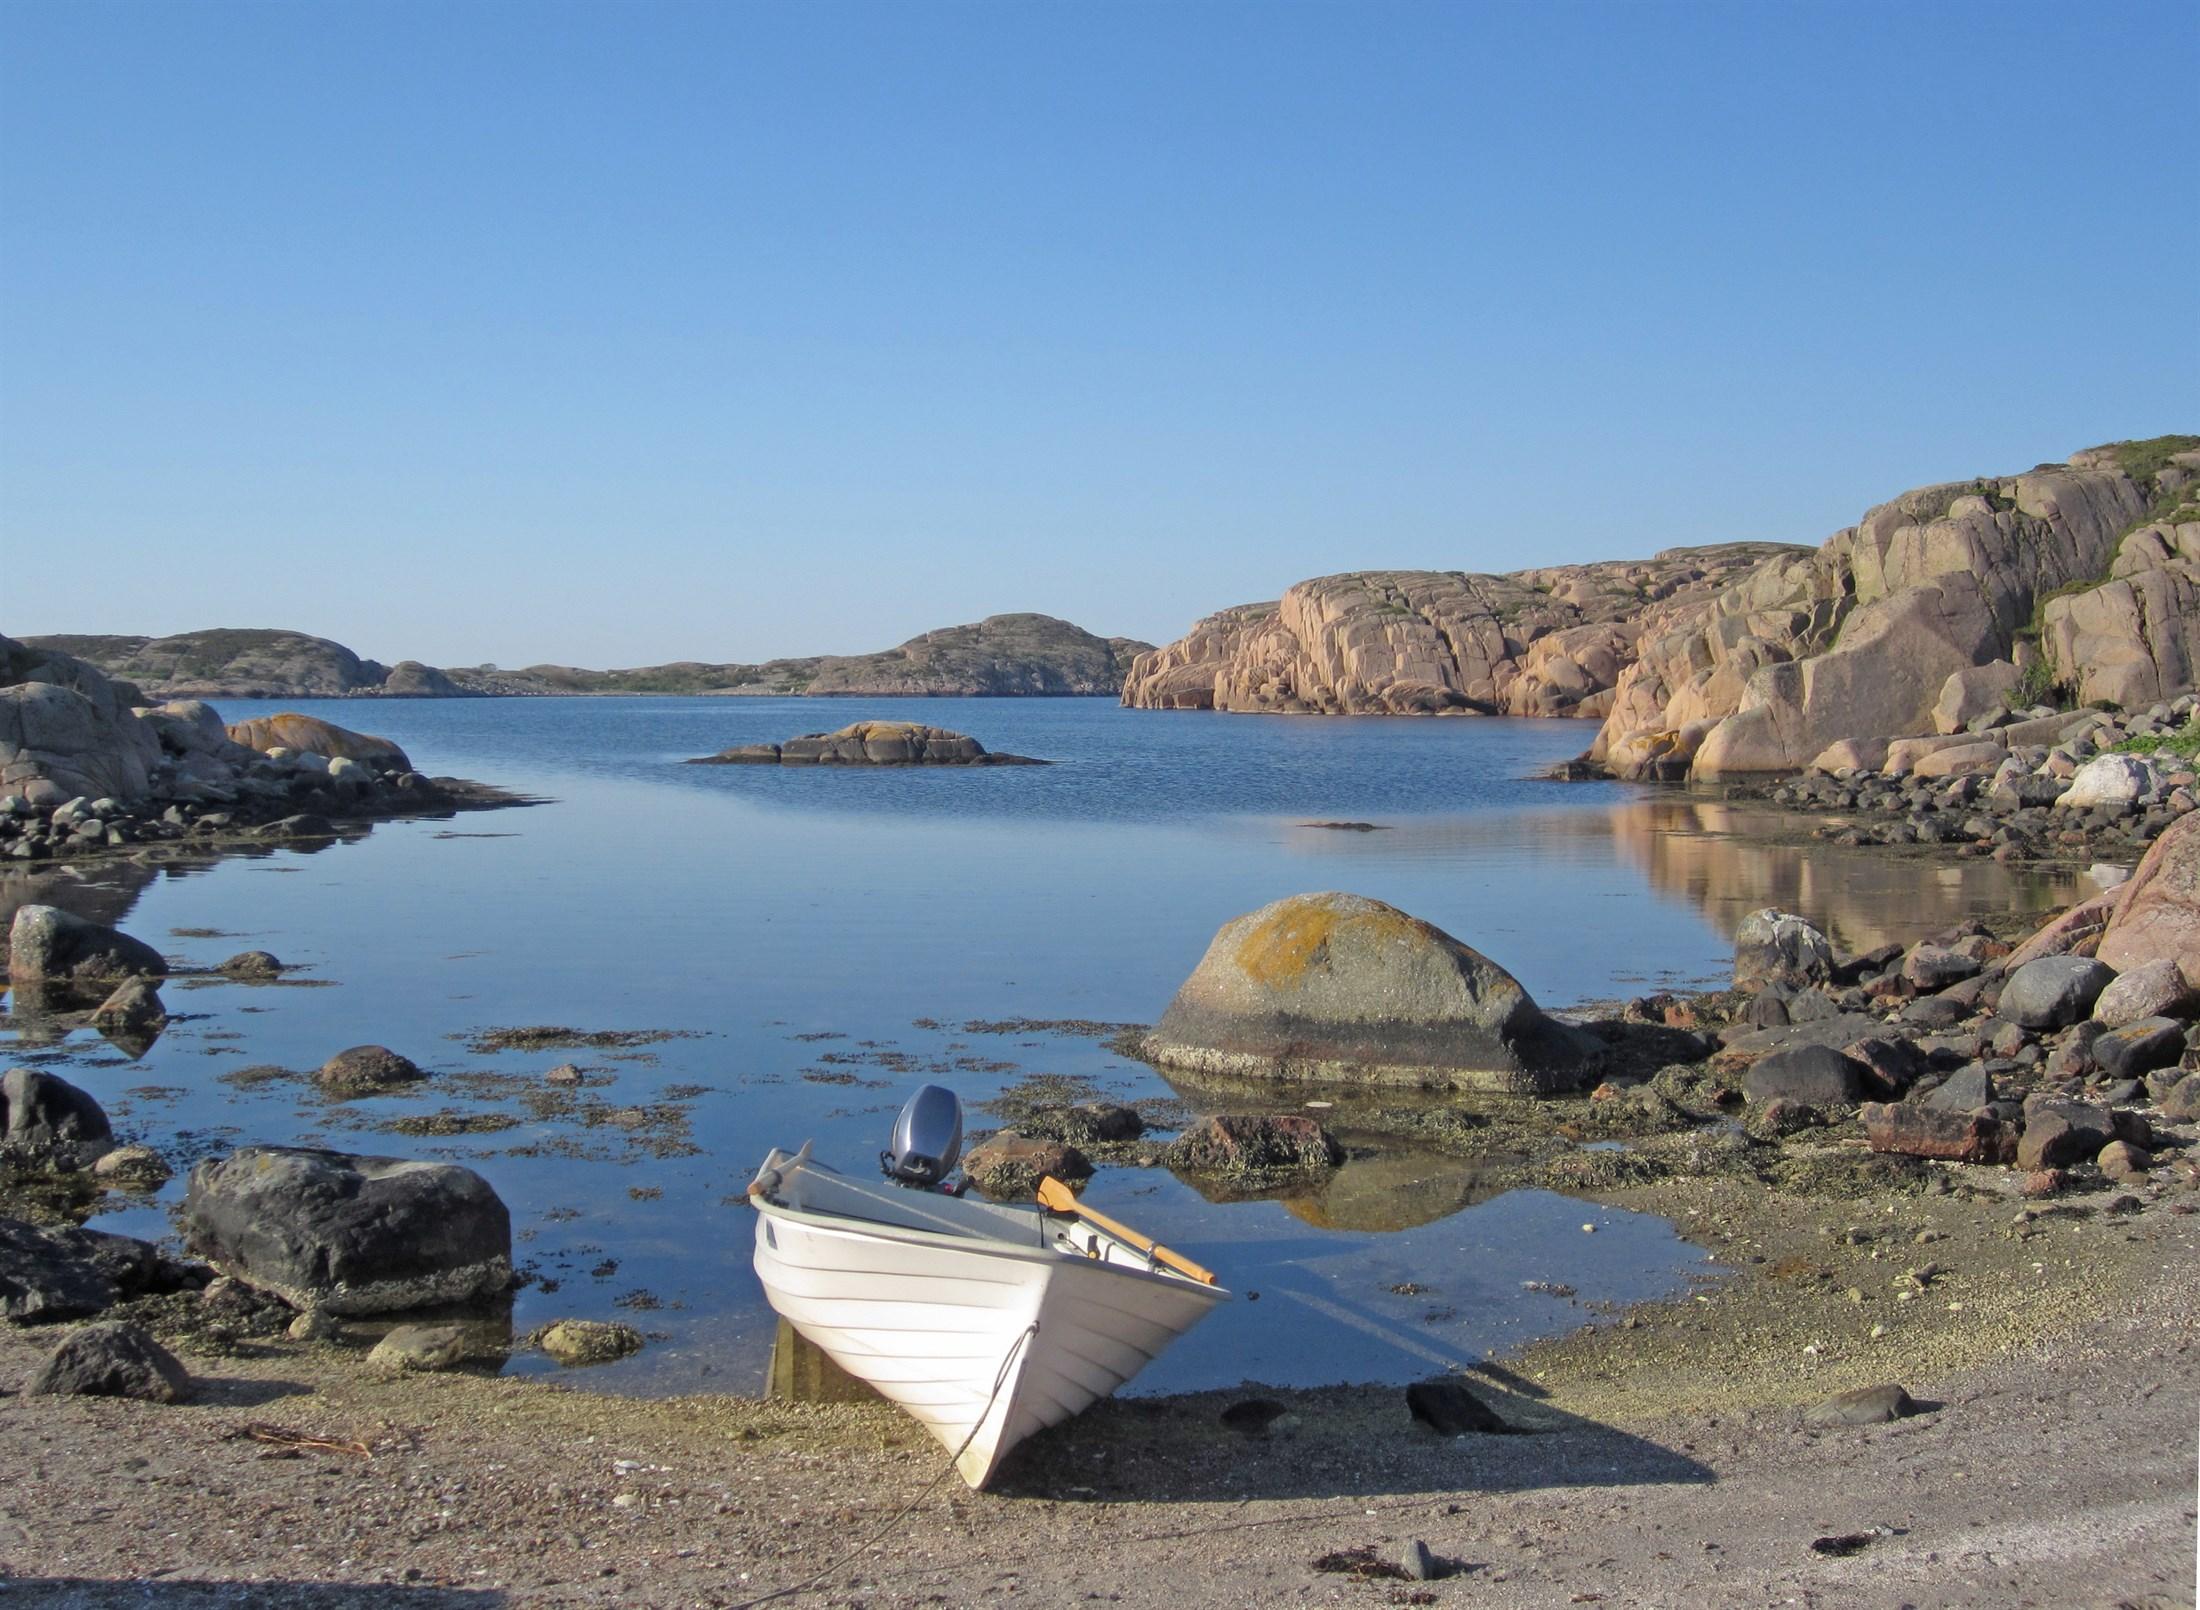 coastal-archipelago-park-of-the-south-coast-sorlandet-of-norway-hvaler-islands_4442-2200x1610px